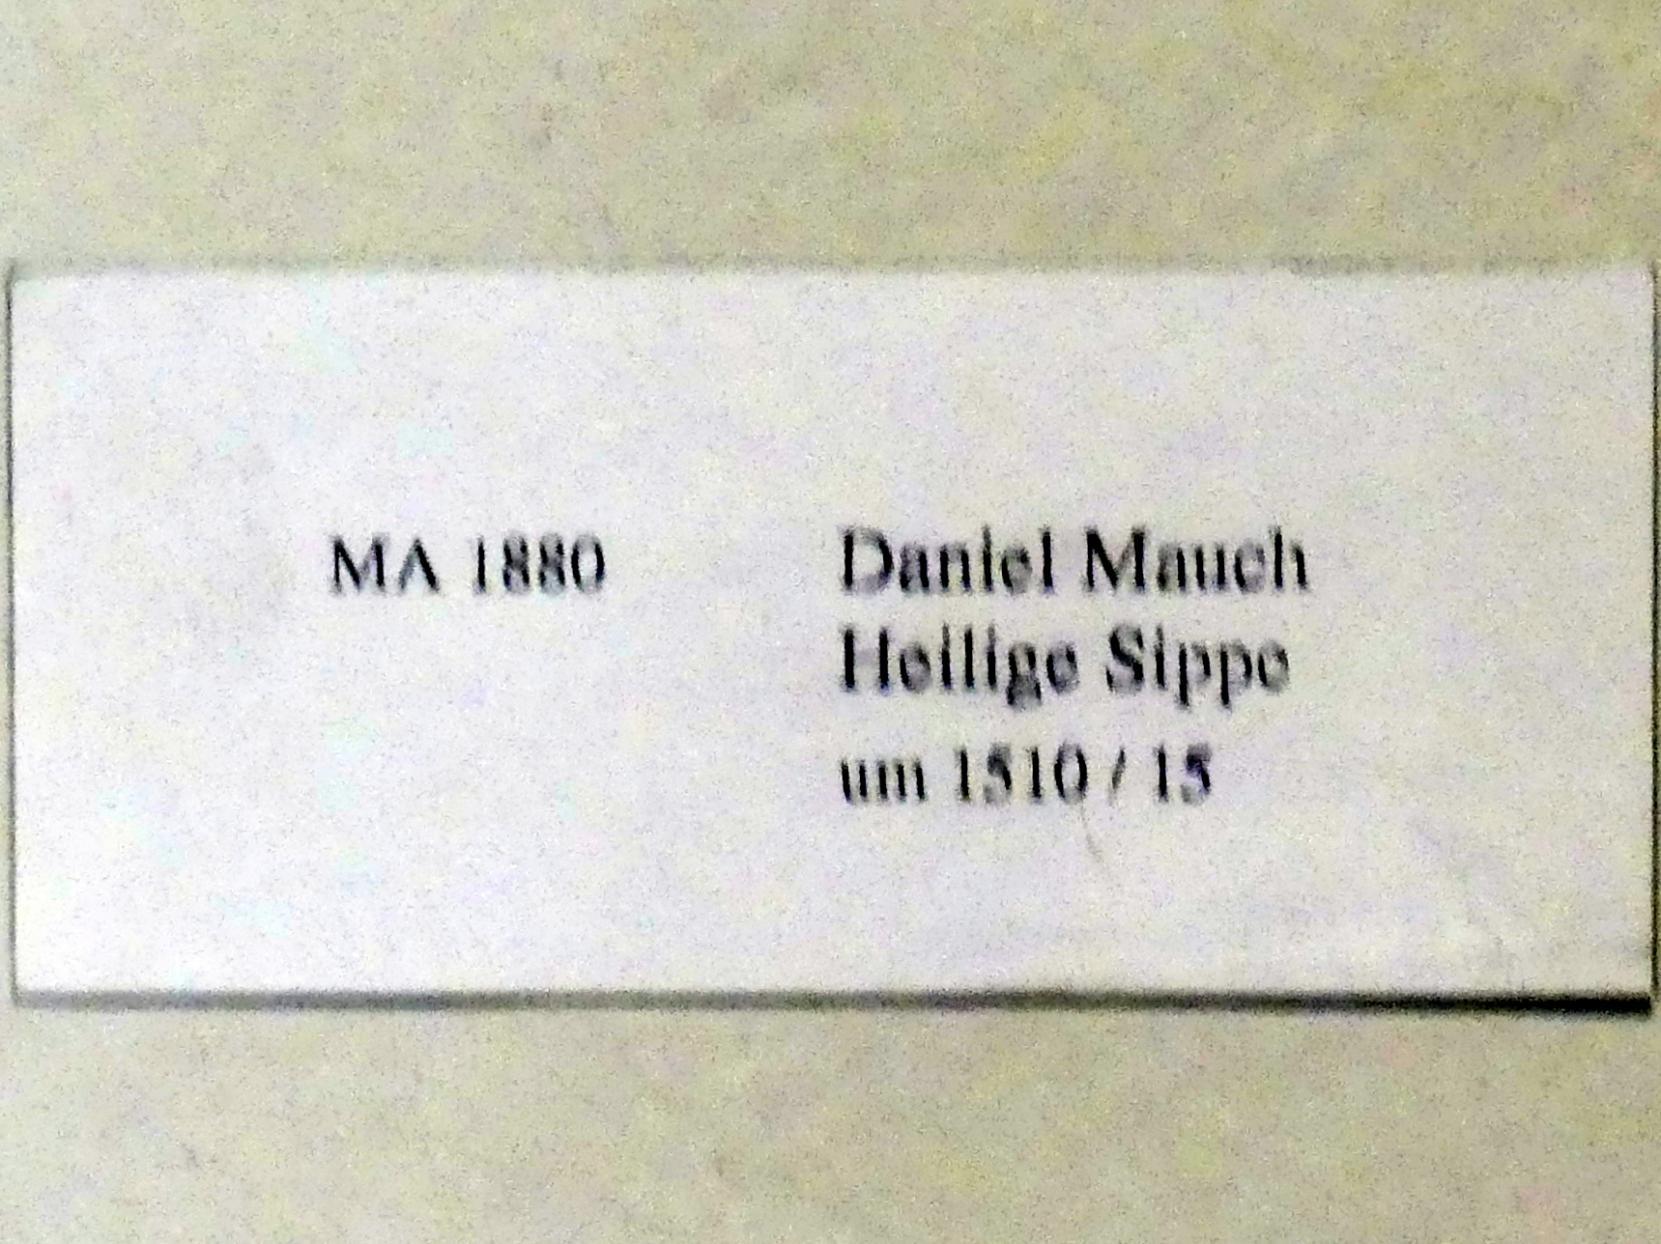 Daniel Mauch: Heilige Sippe, Um 1510 - 1515